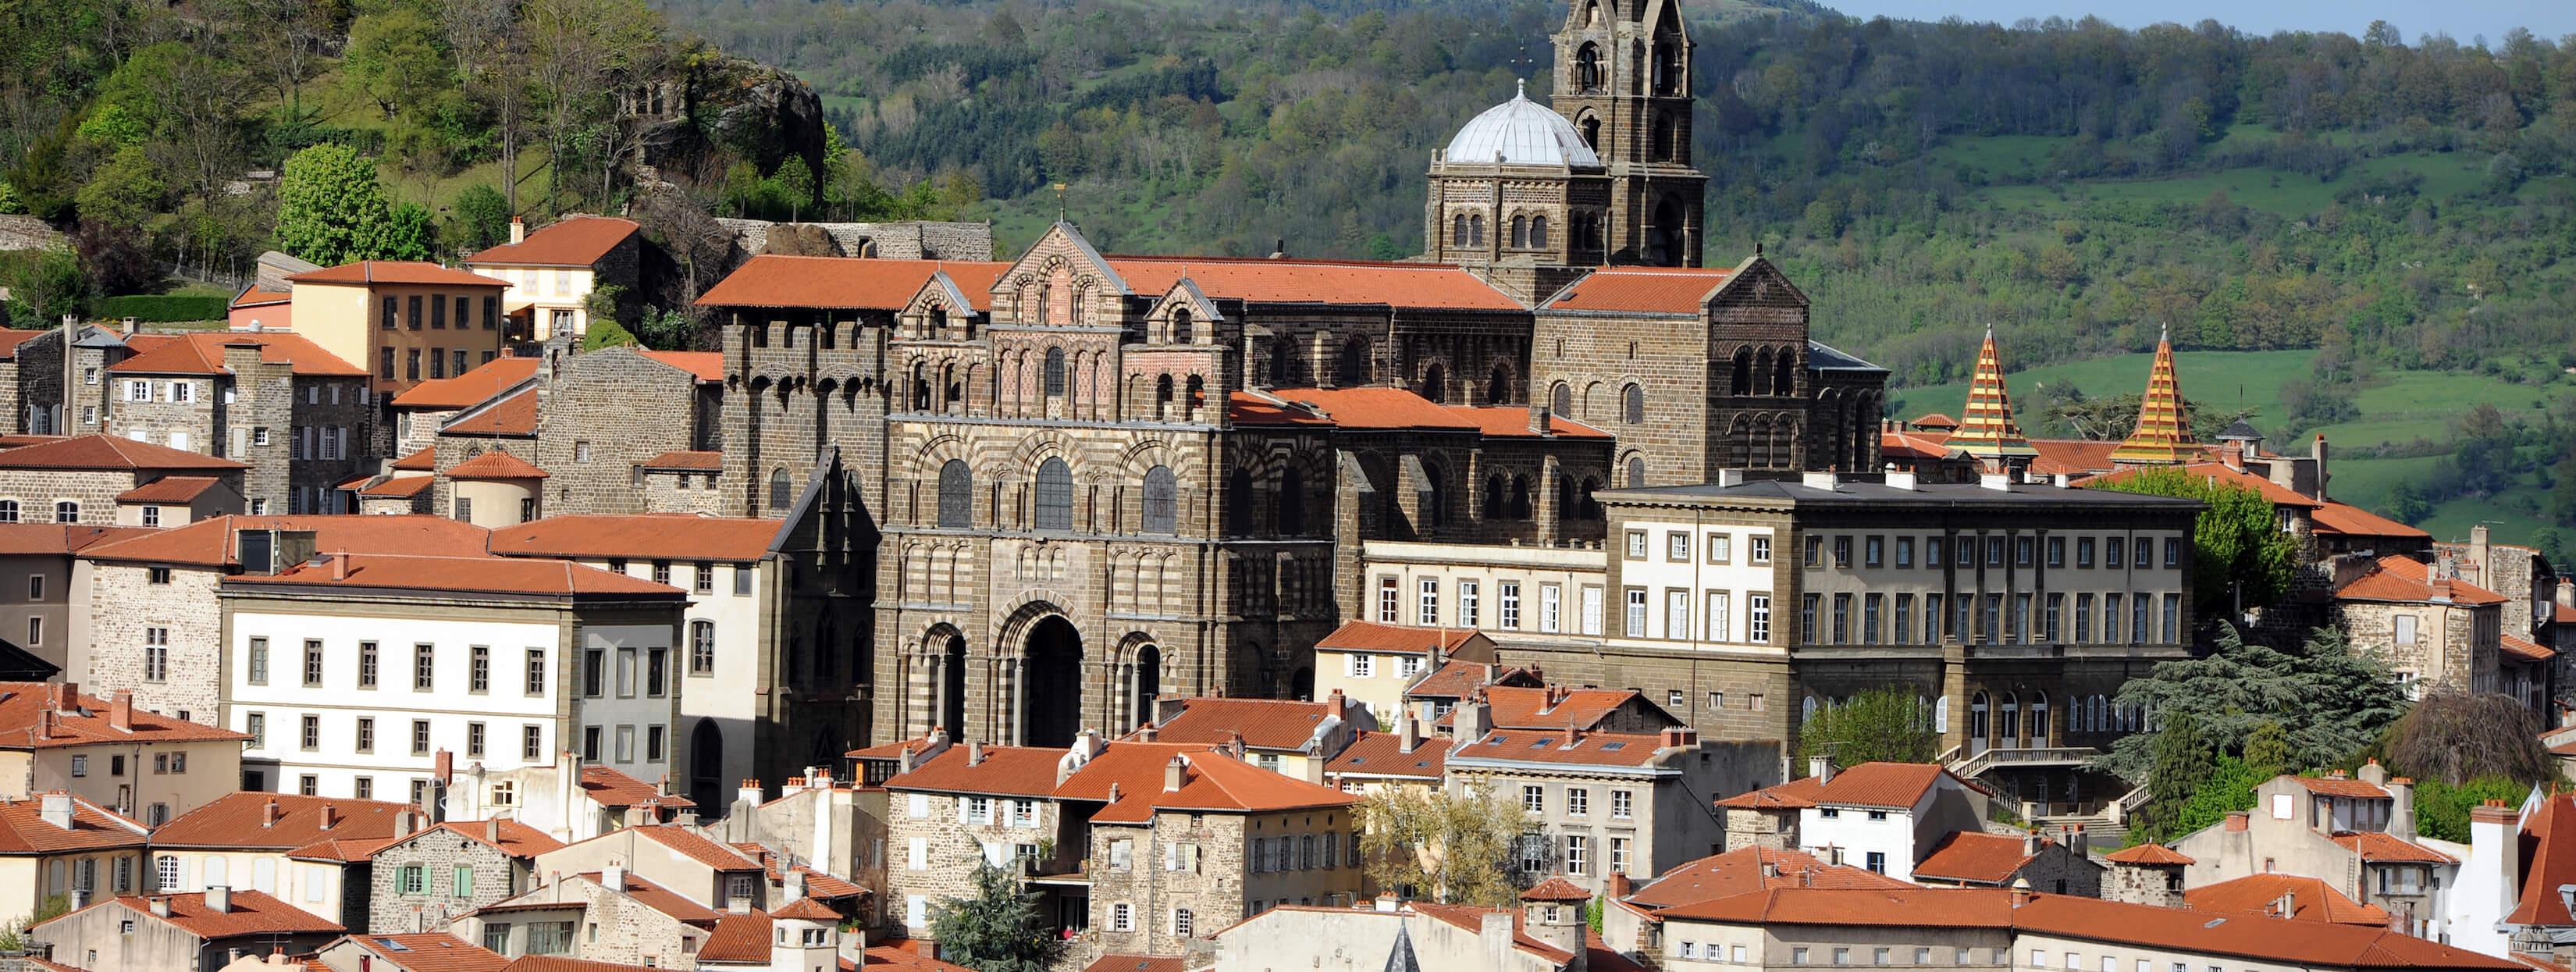 Cathédrale Notre-Dame©ACIR / JJ Gelbart